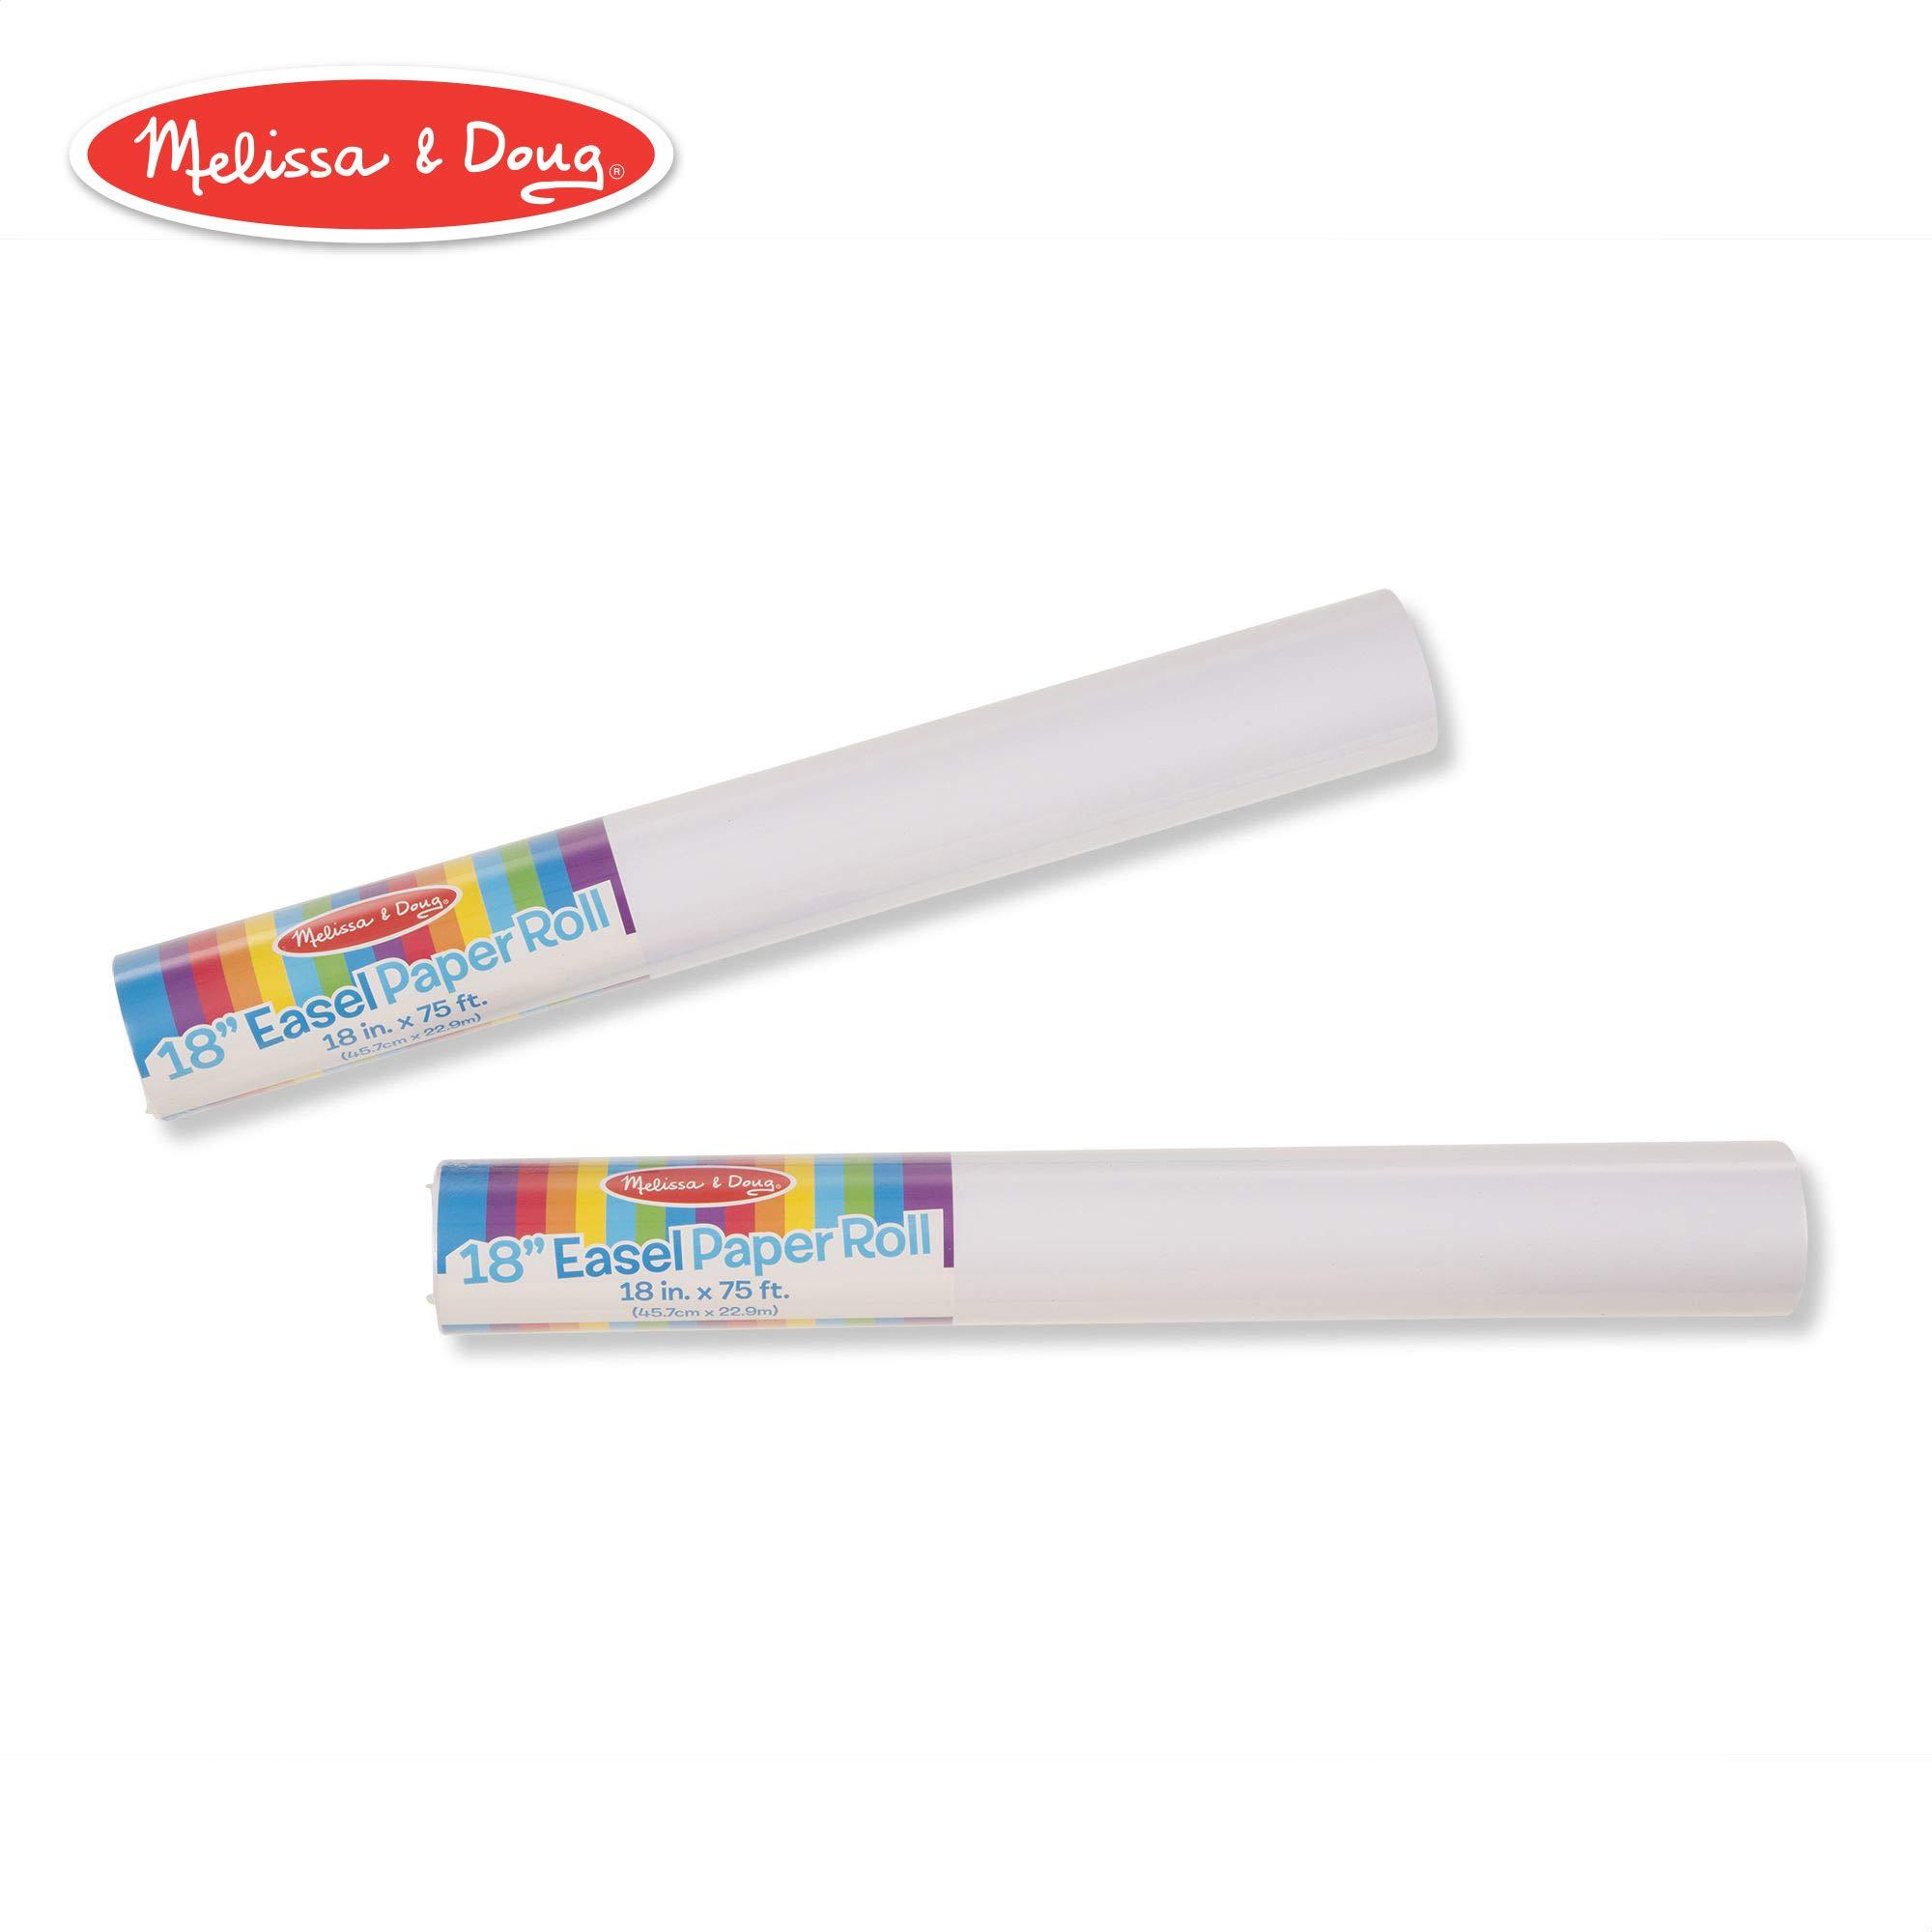 Melissa & Doug 18-Inch Easel Paper Rolls, Arts & Crafts, Bond Paper, 75-Foot Roll, 2-Pack, 18″ W × 75′ L by Melissa & Doug